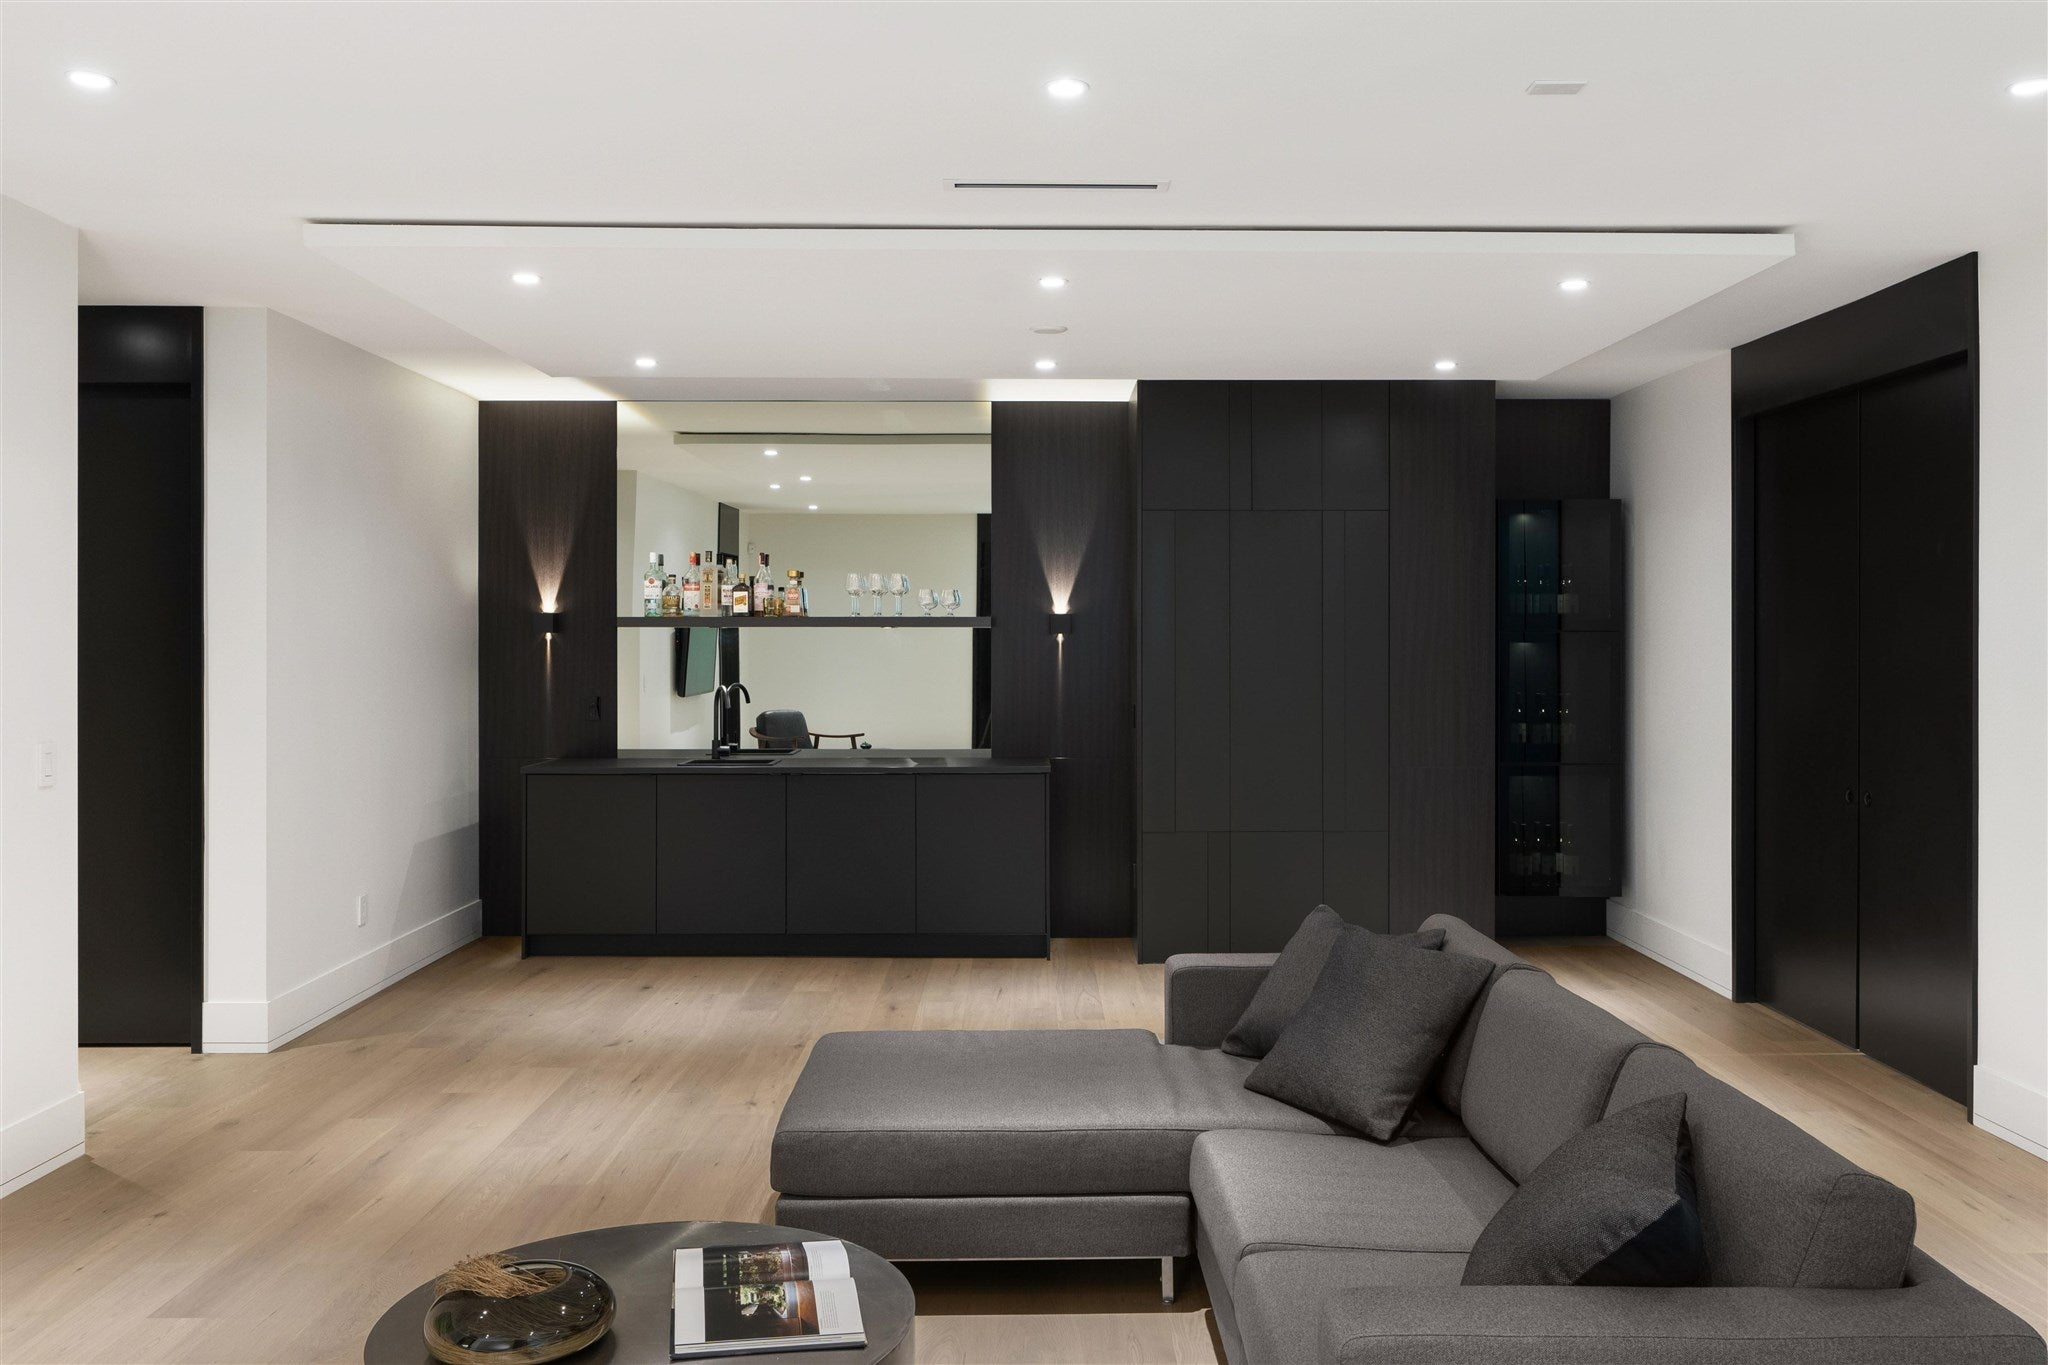 276 SANDRINGHAM CRESCENT - Upper Lonsdale House/Single Family for sale, 7 Bedrooms (R2617703) - #34